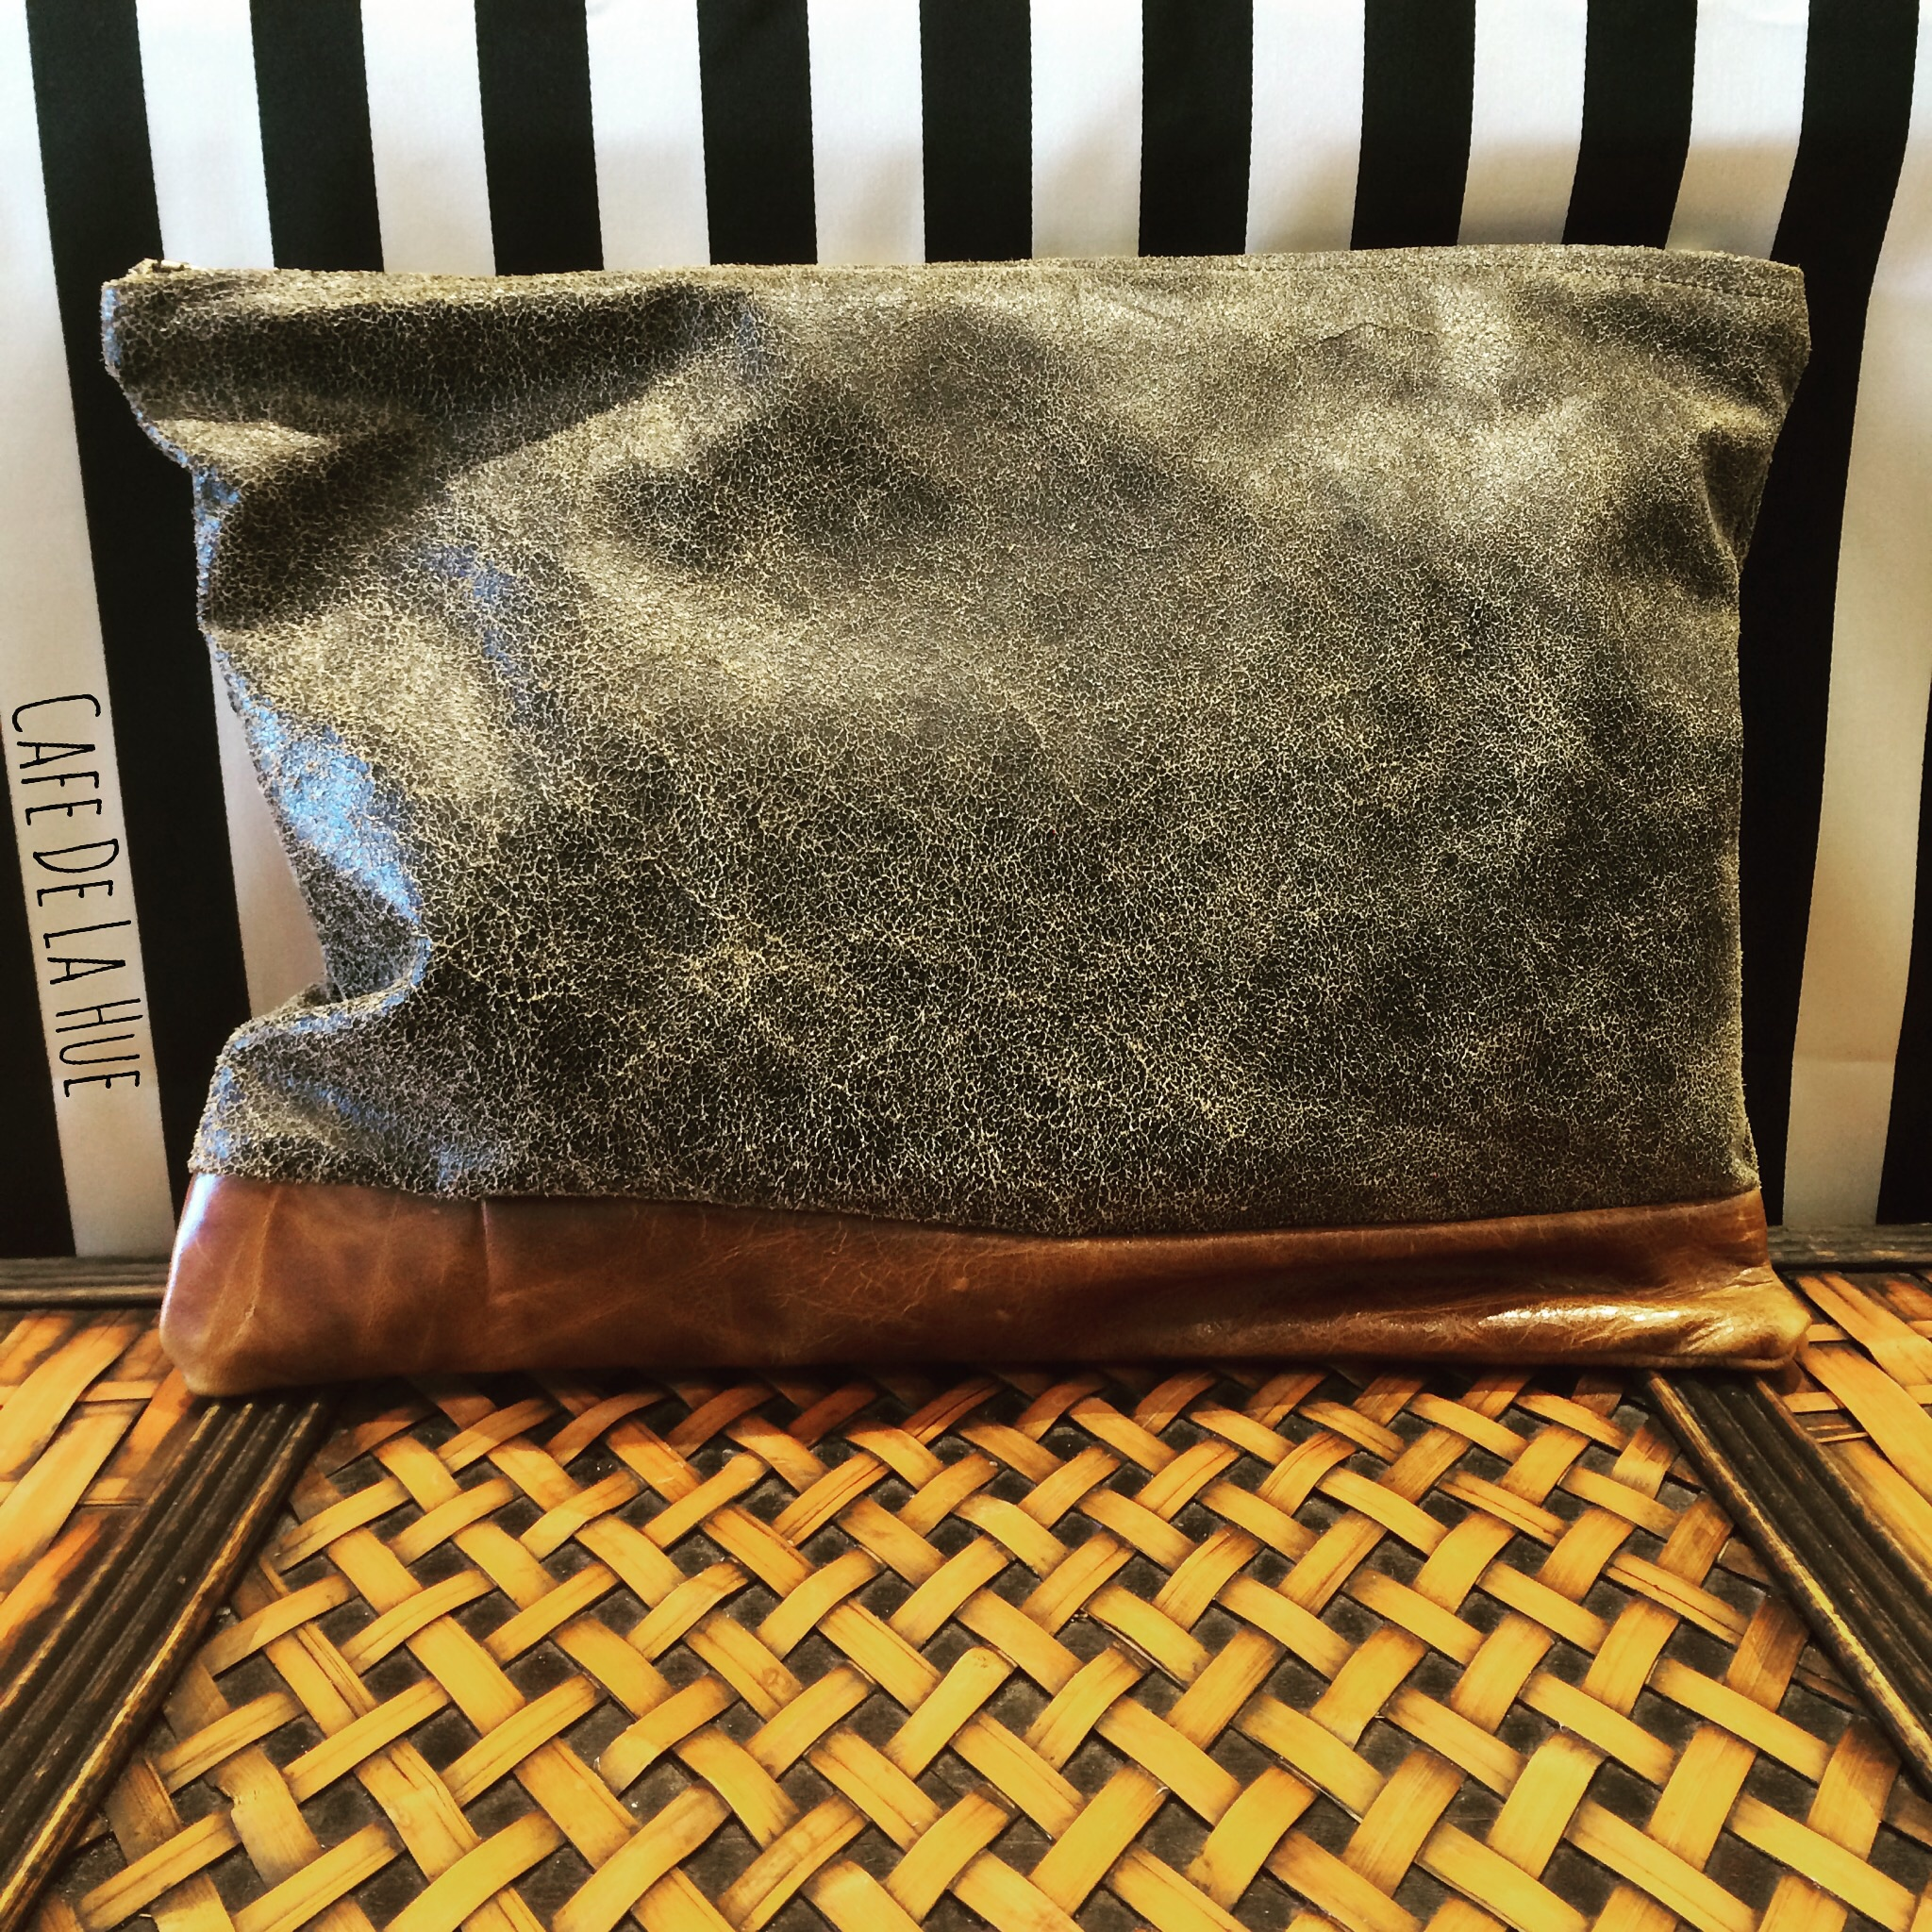 Image of Rustic Sweetbread - Hand Bag